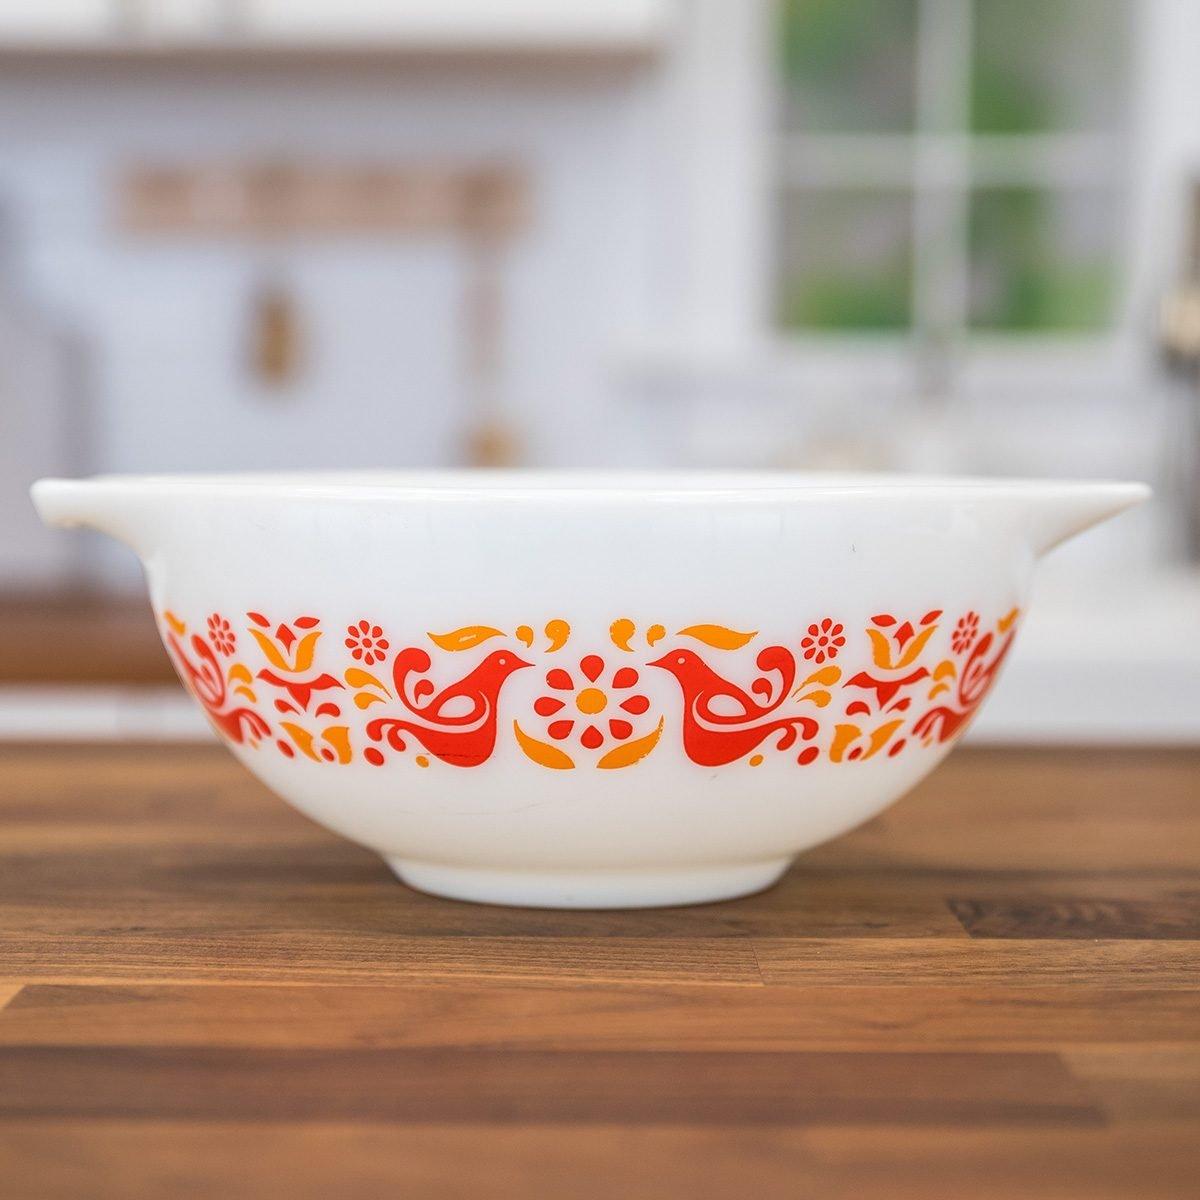 Vintage Pyrex bowl in Friendship pattern